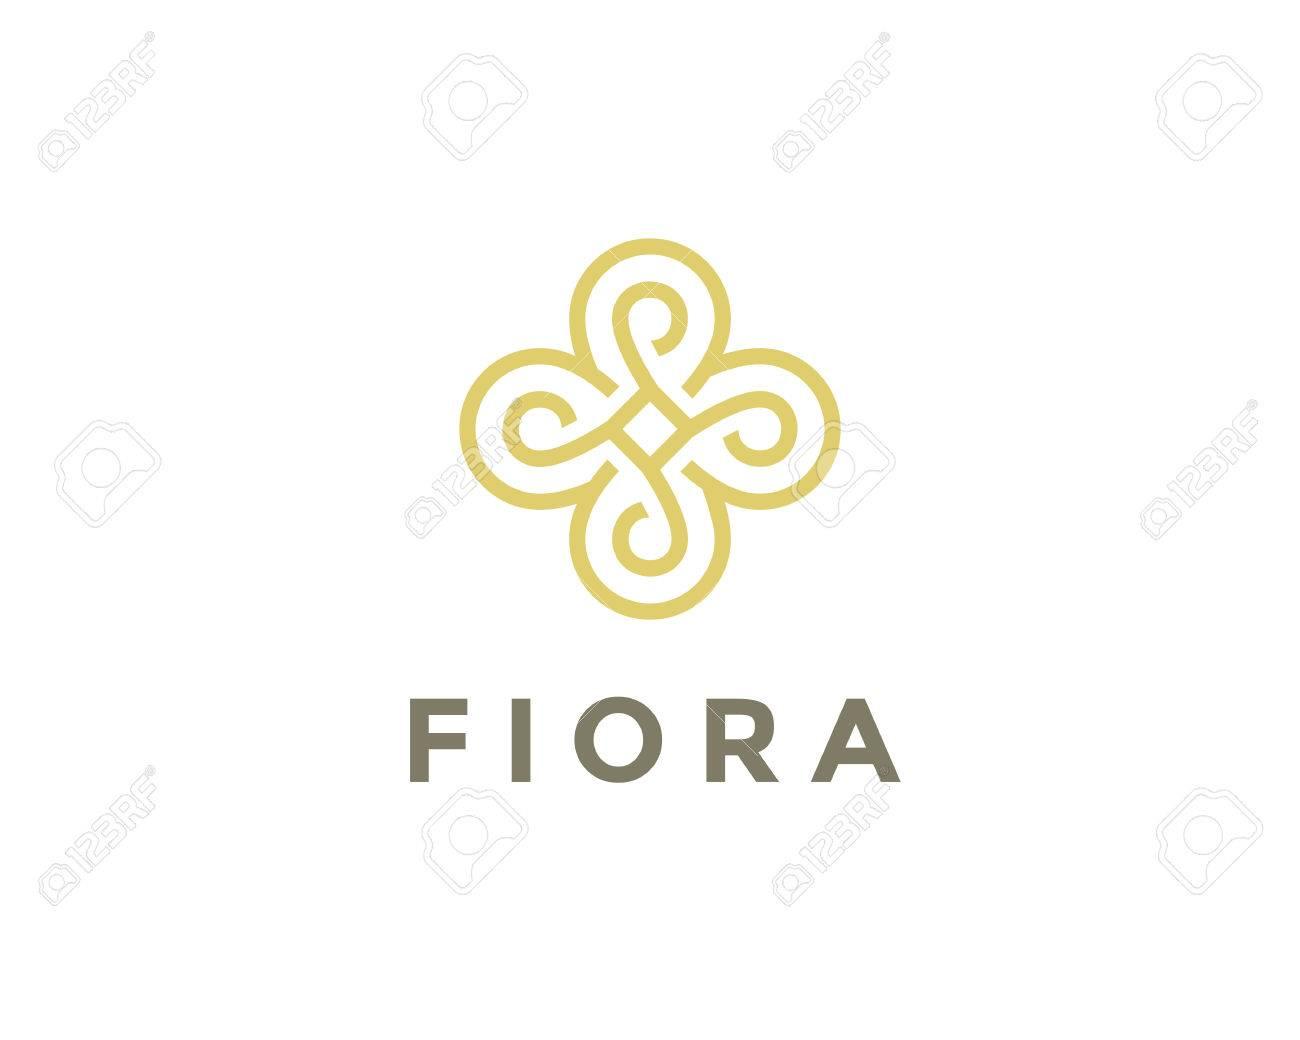 abstract gold flower logo design unusual golden floral symbol